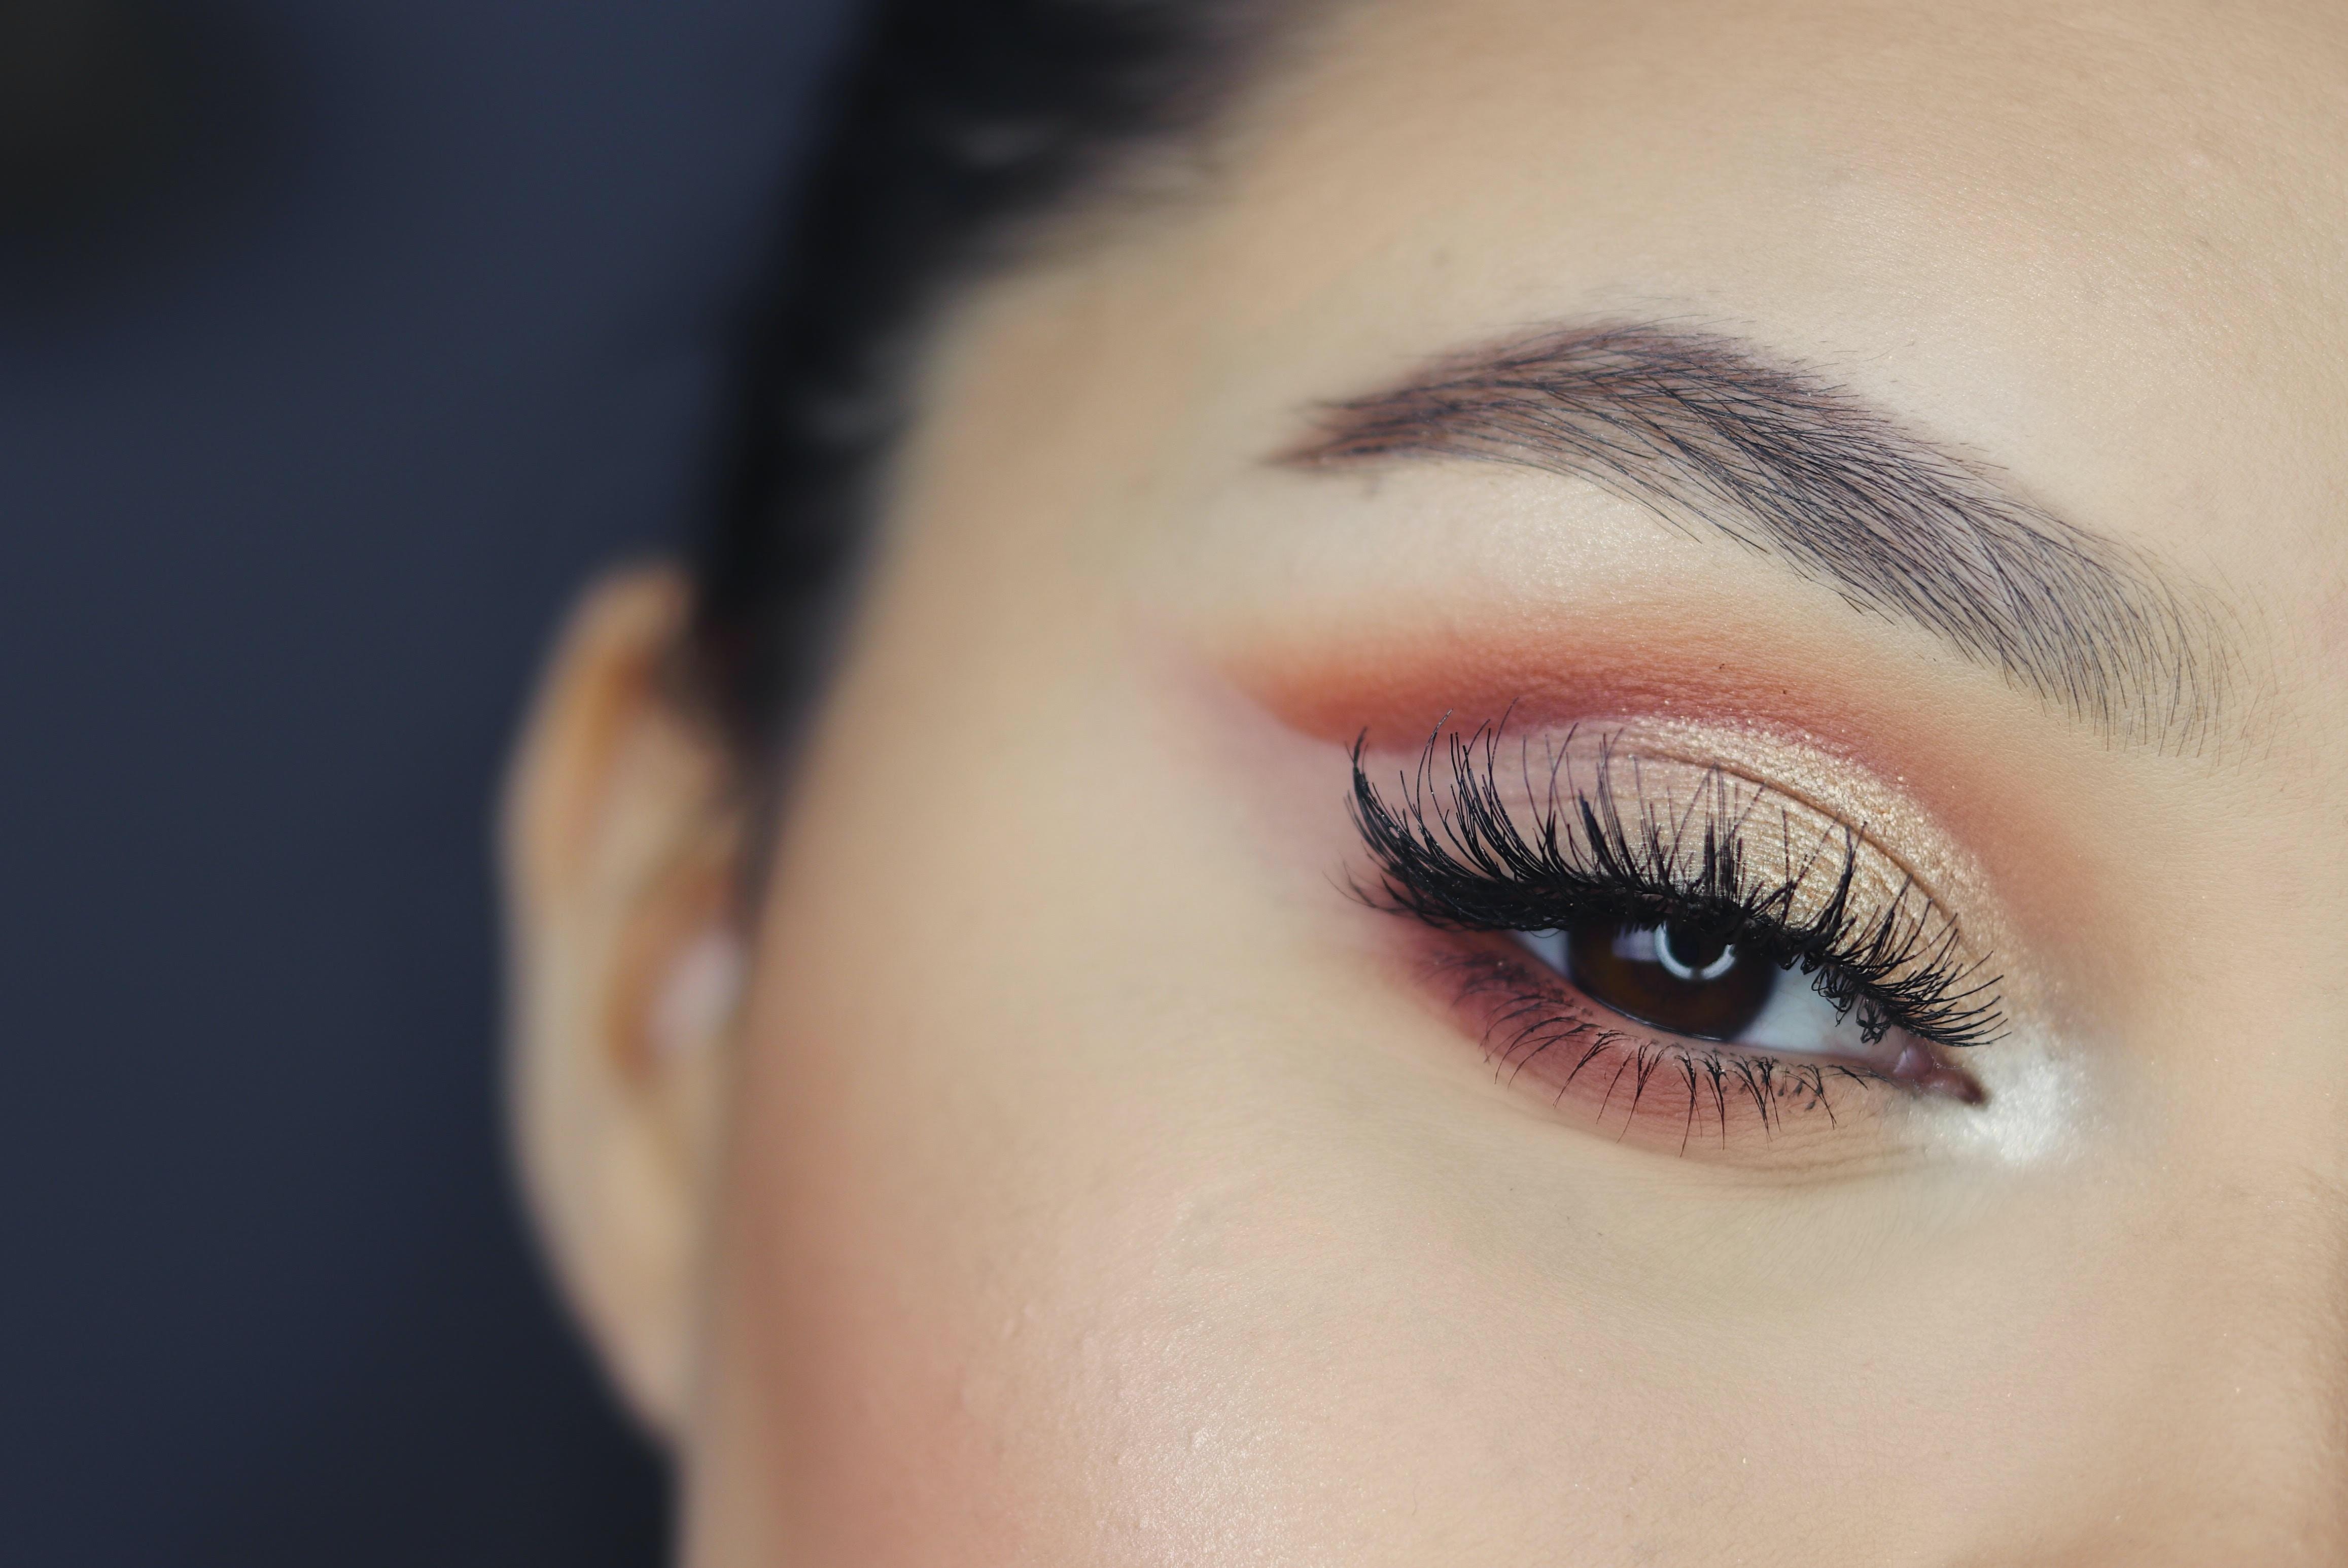 woman with black mascara